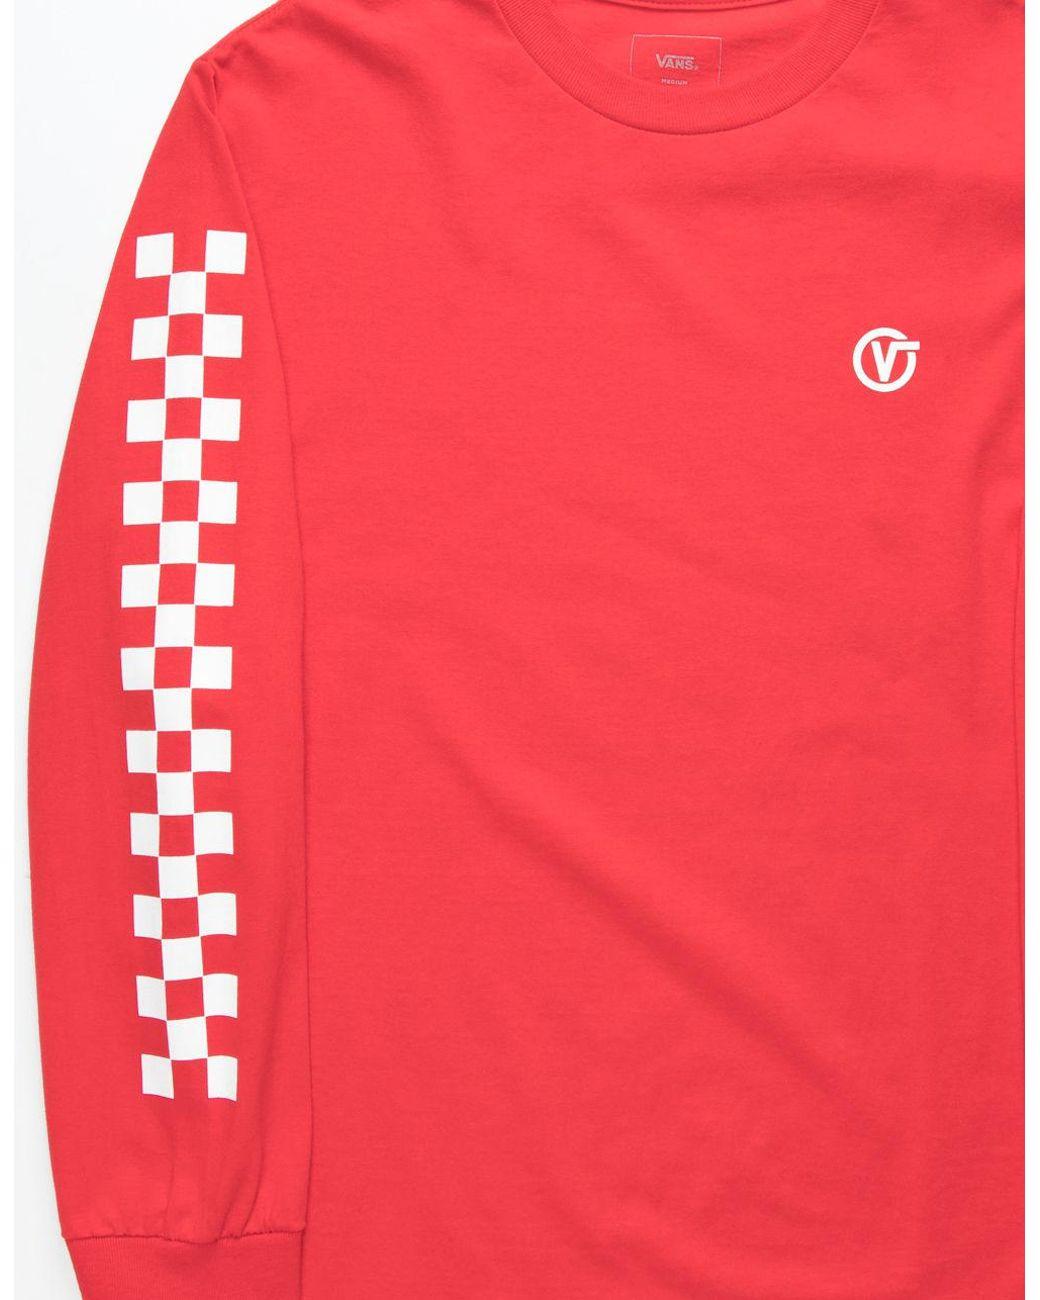 c02067d6324e5a Lyst - Vans Classic Circle V Mens T-shirt in Red for Men